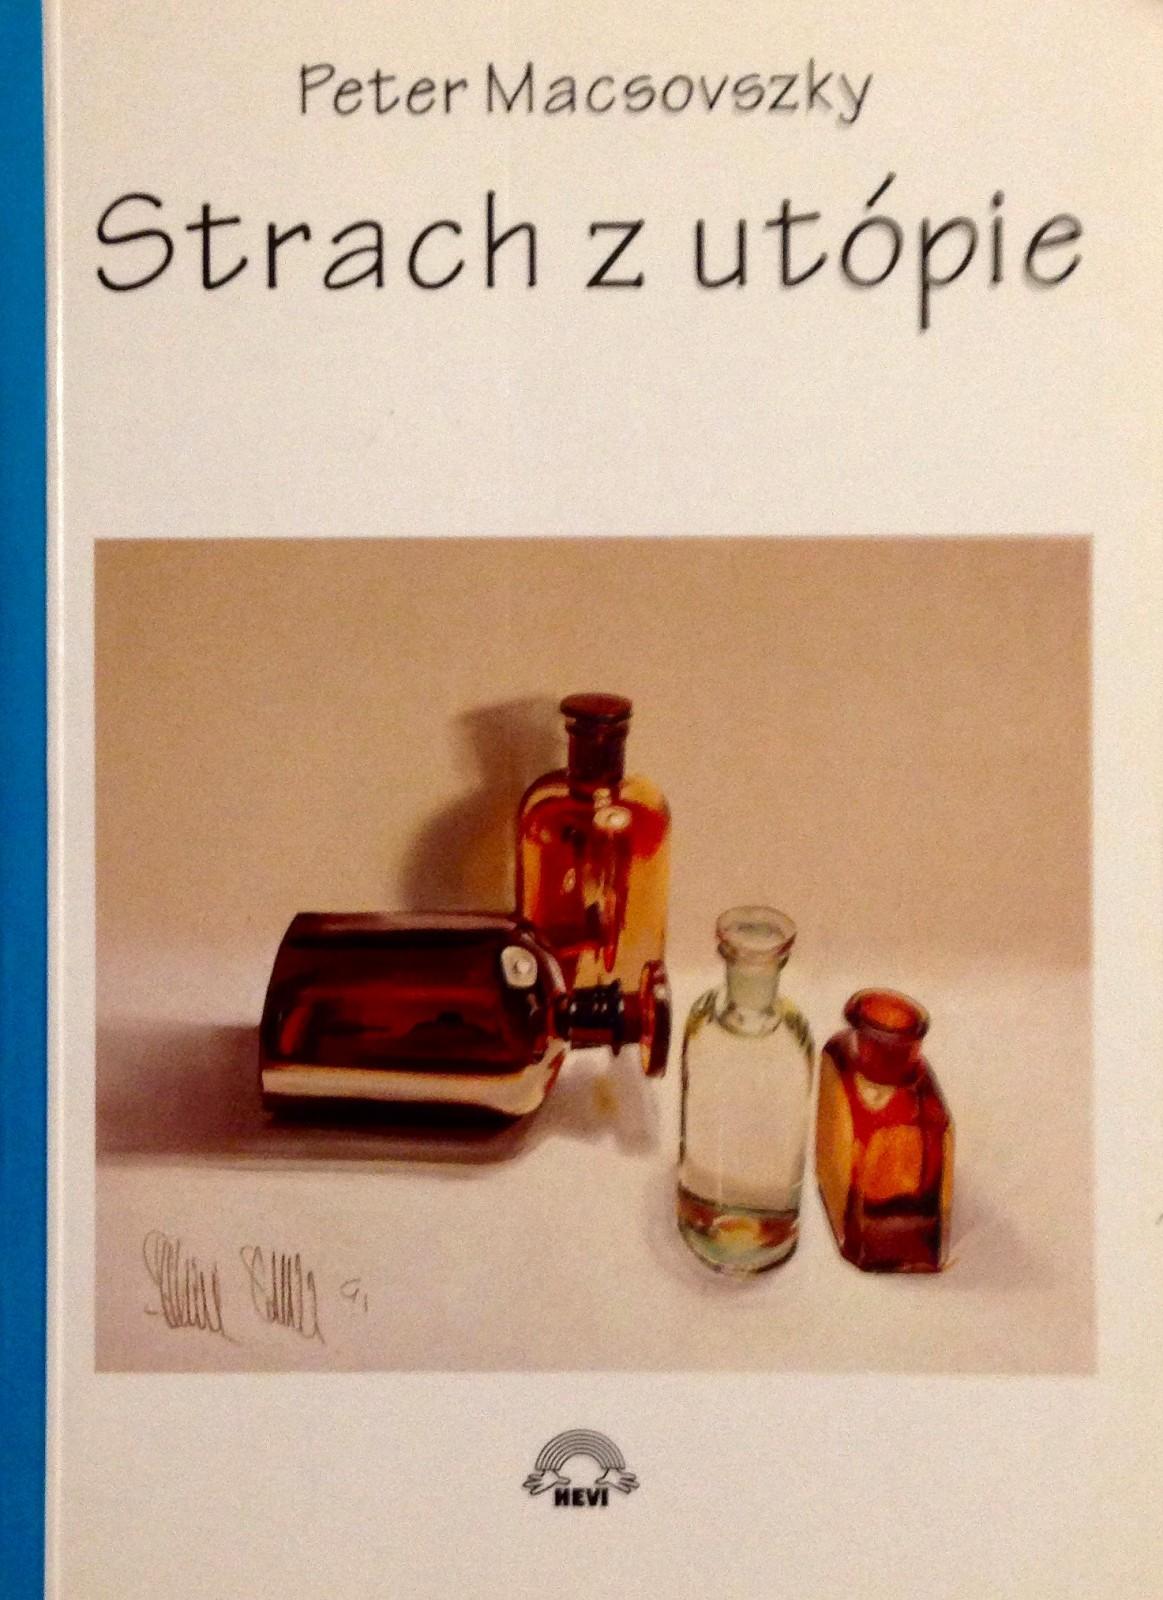 macsovszky_strach_z_utopie